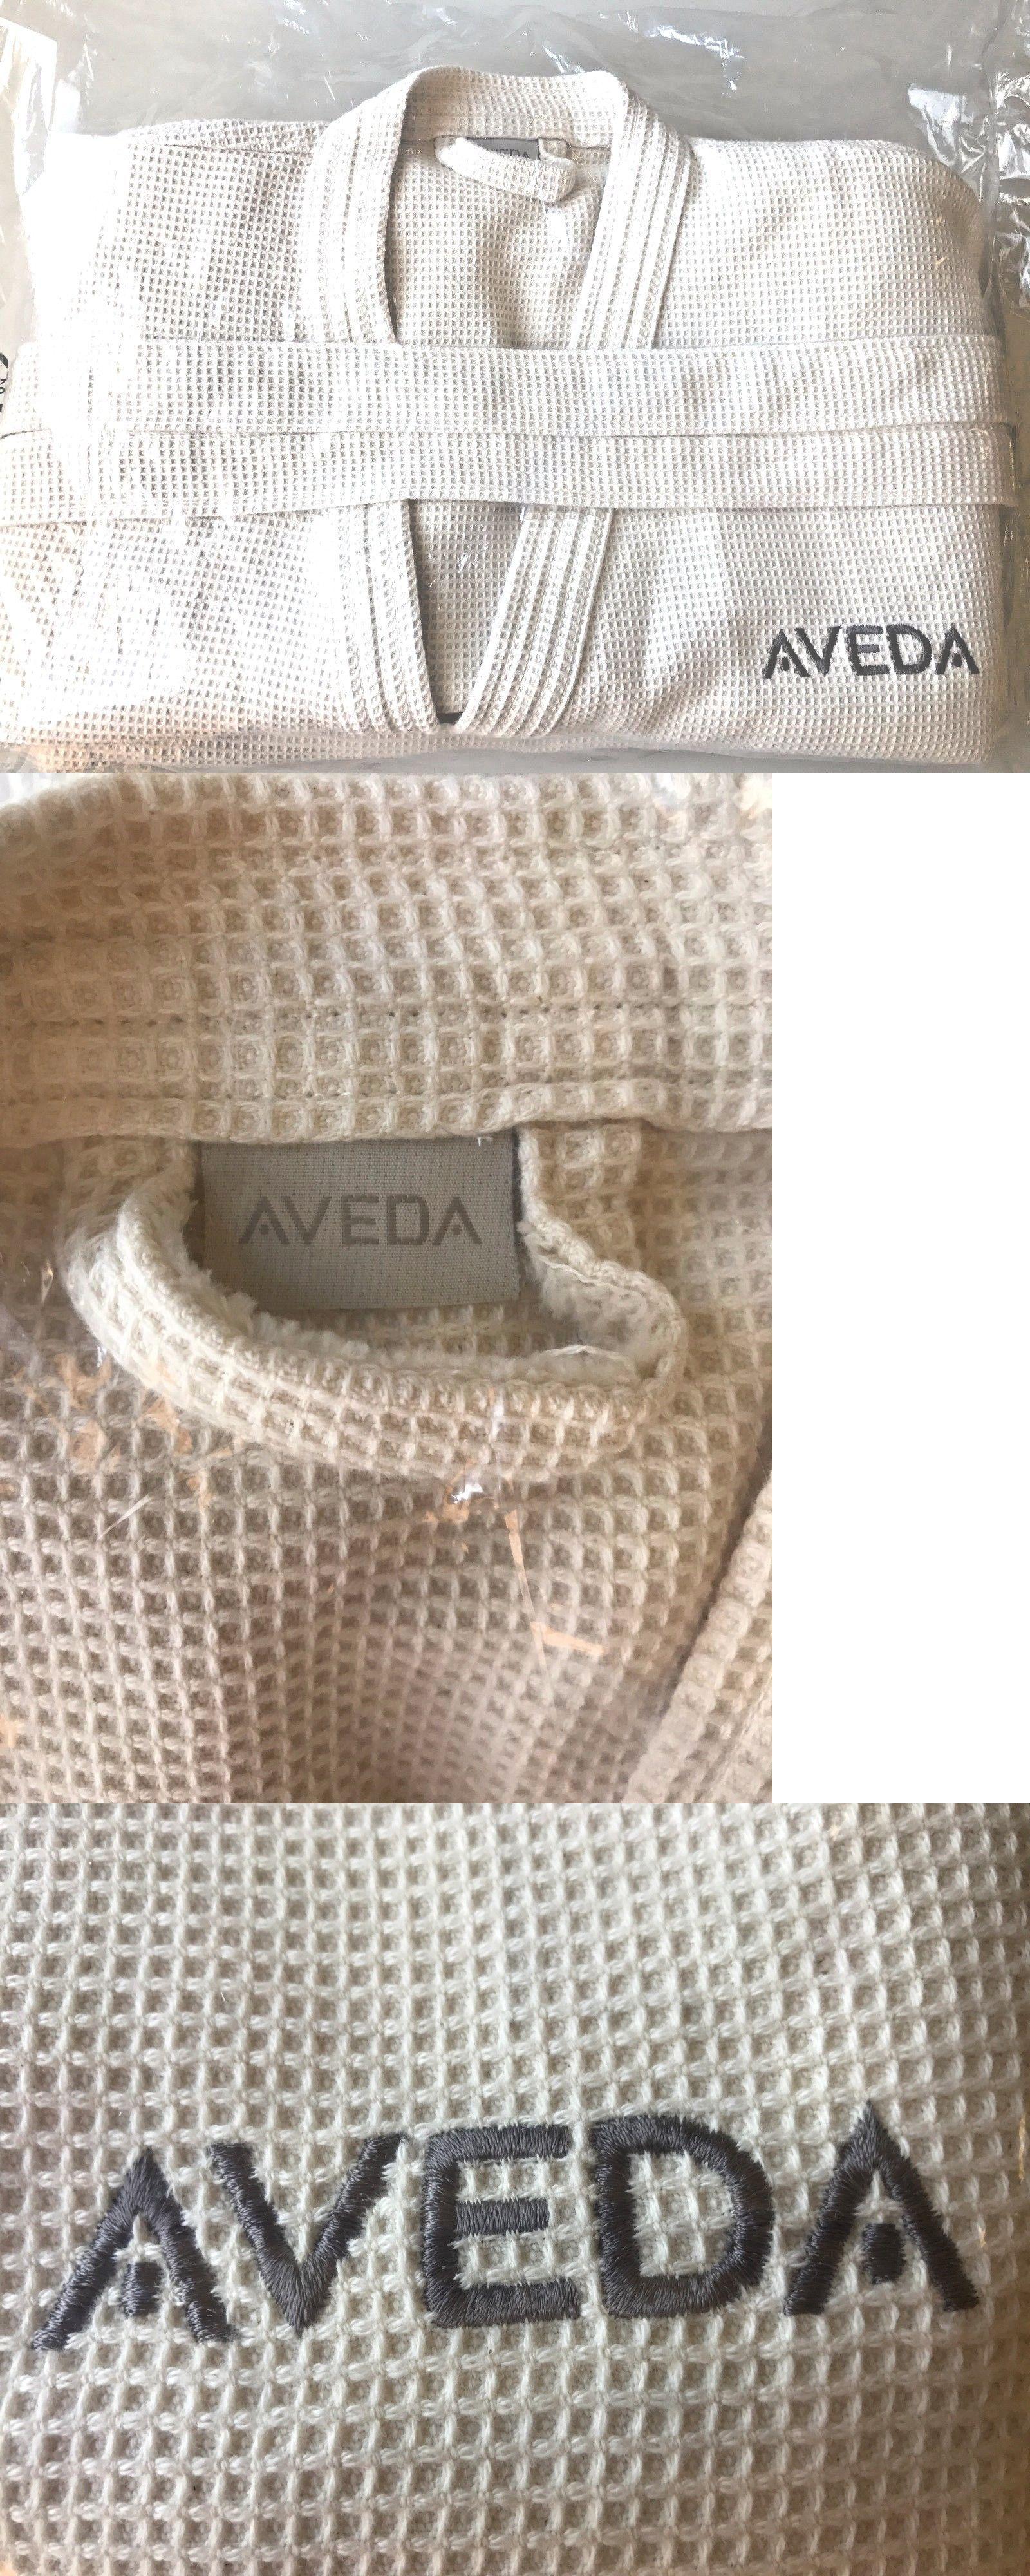 Bath Sets and Kits: Aveda Kimono Style Spa Bath Robe 100% Cotton New ...